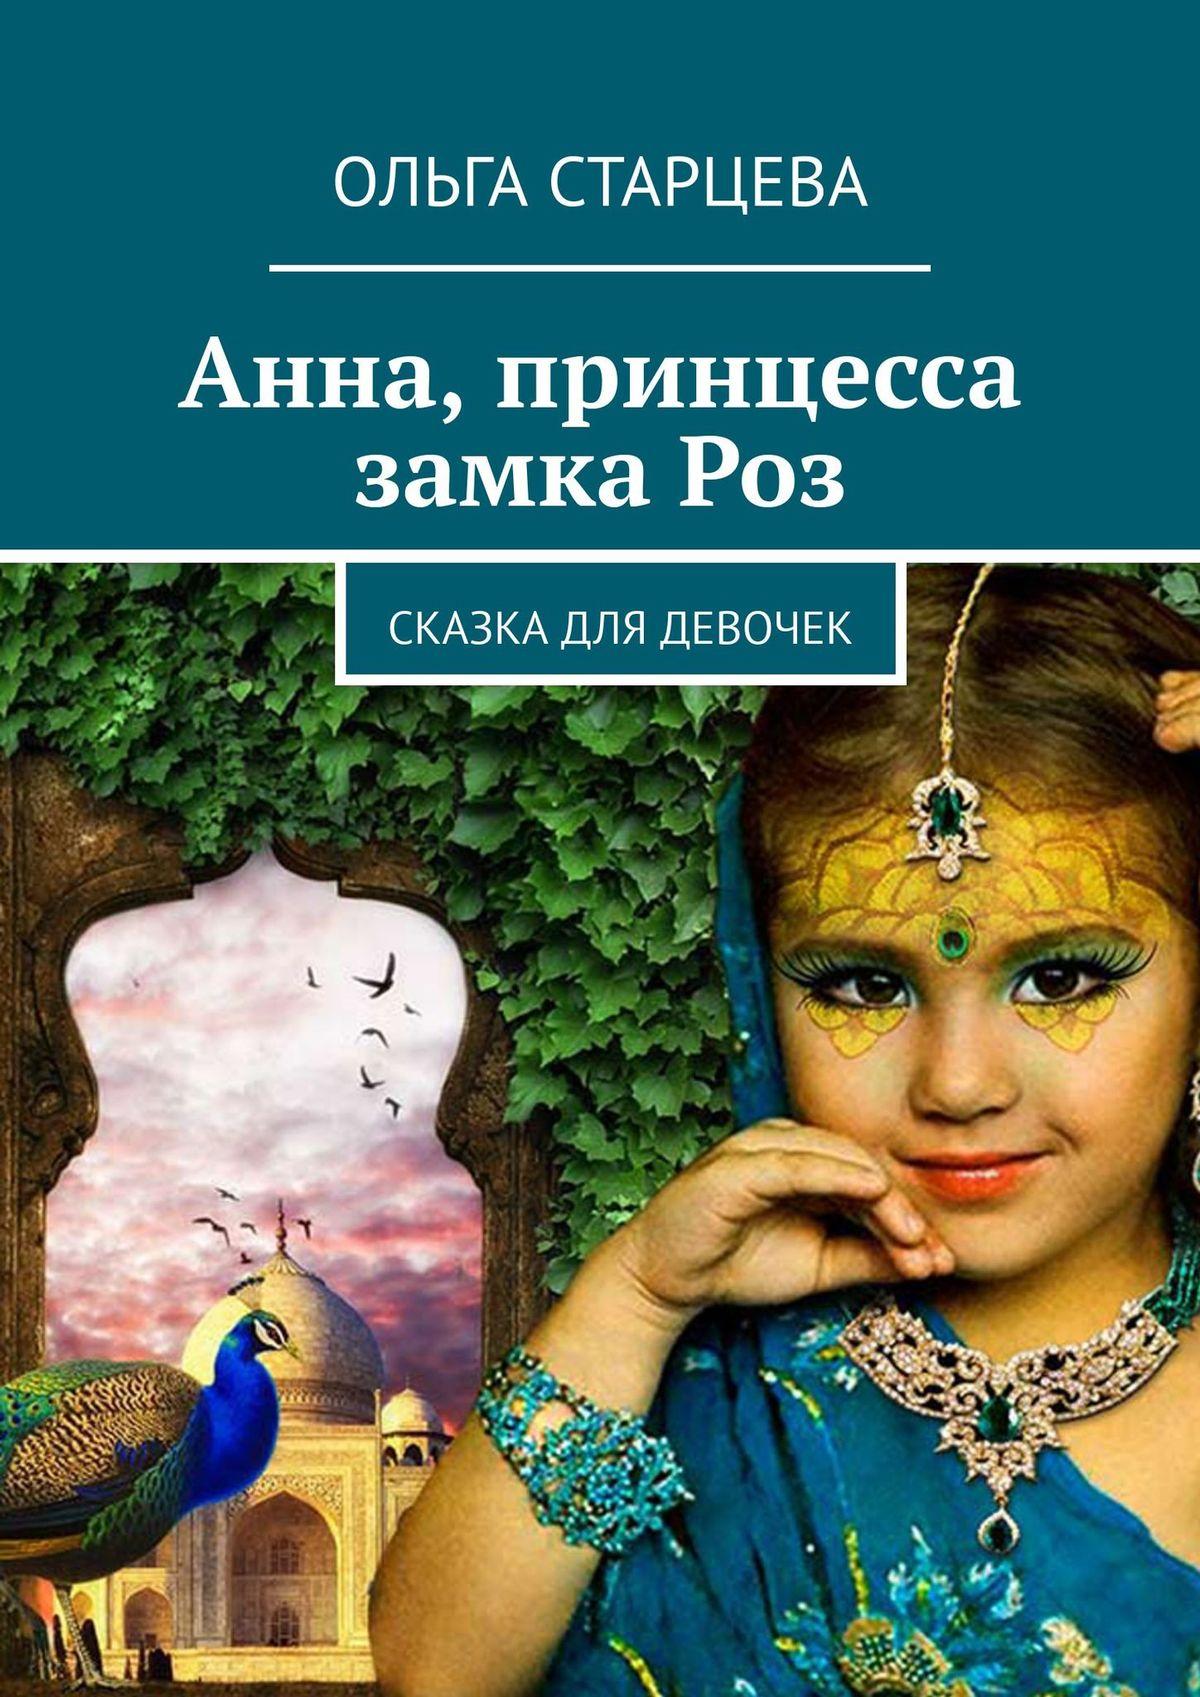 цена Ольга Старцева Анна, принцесса замкаРоз